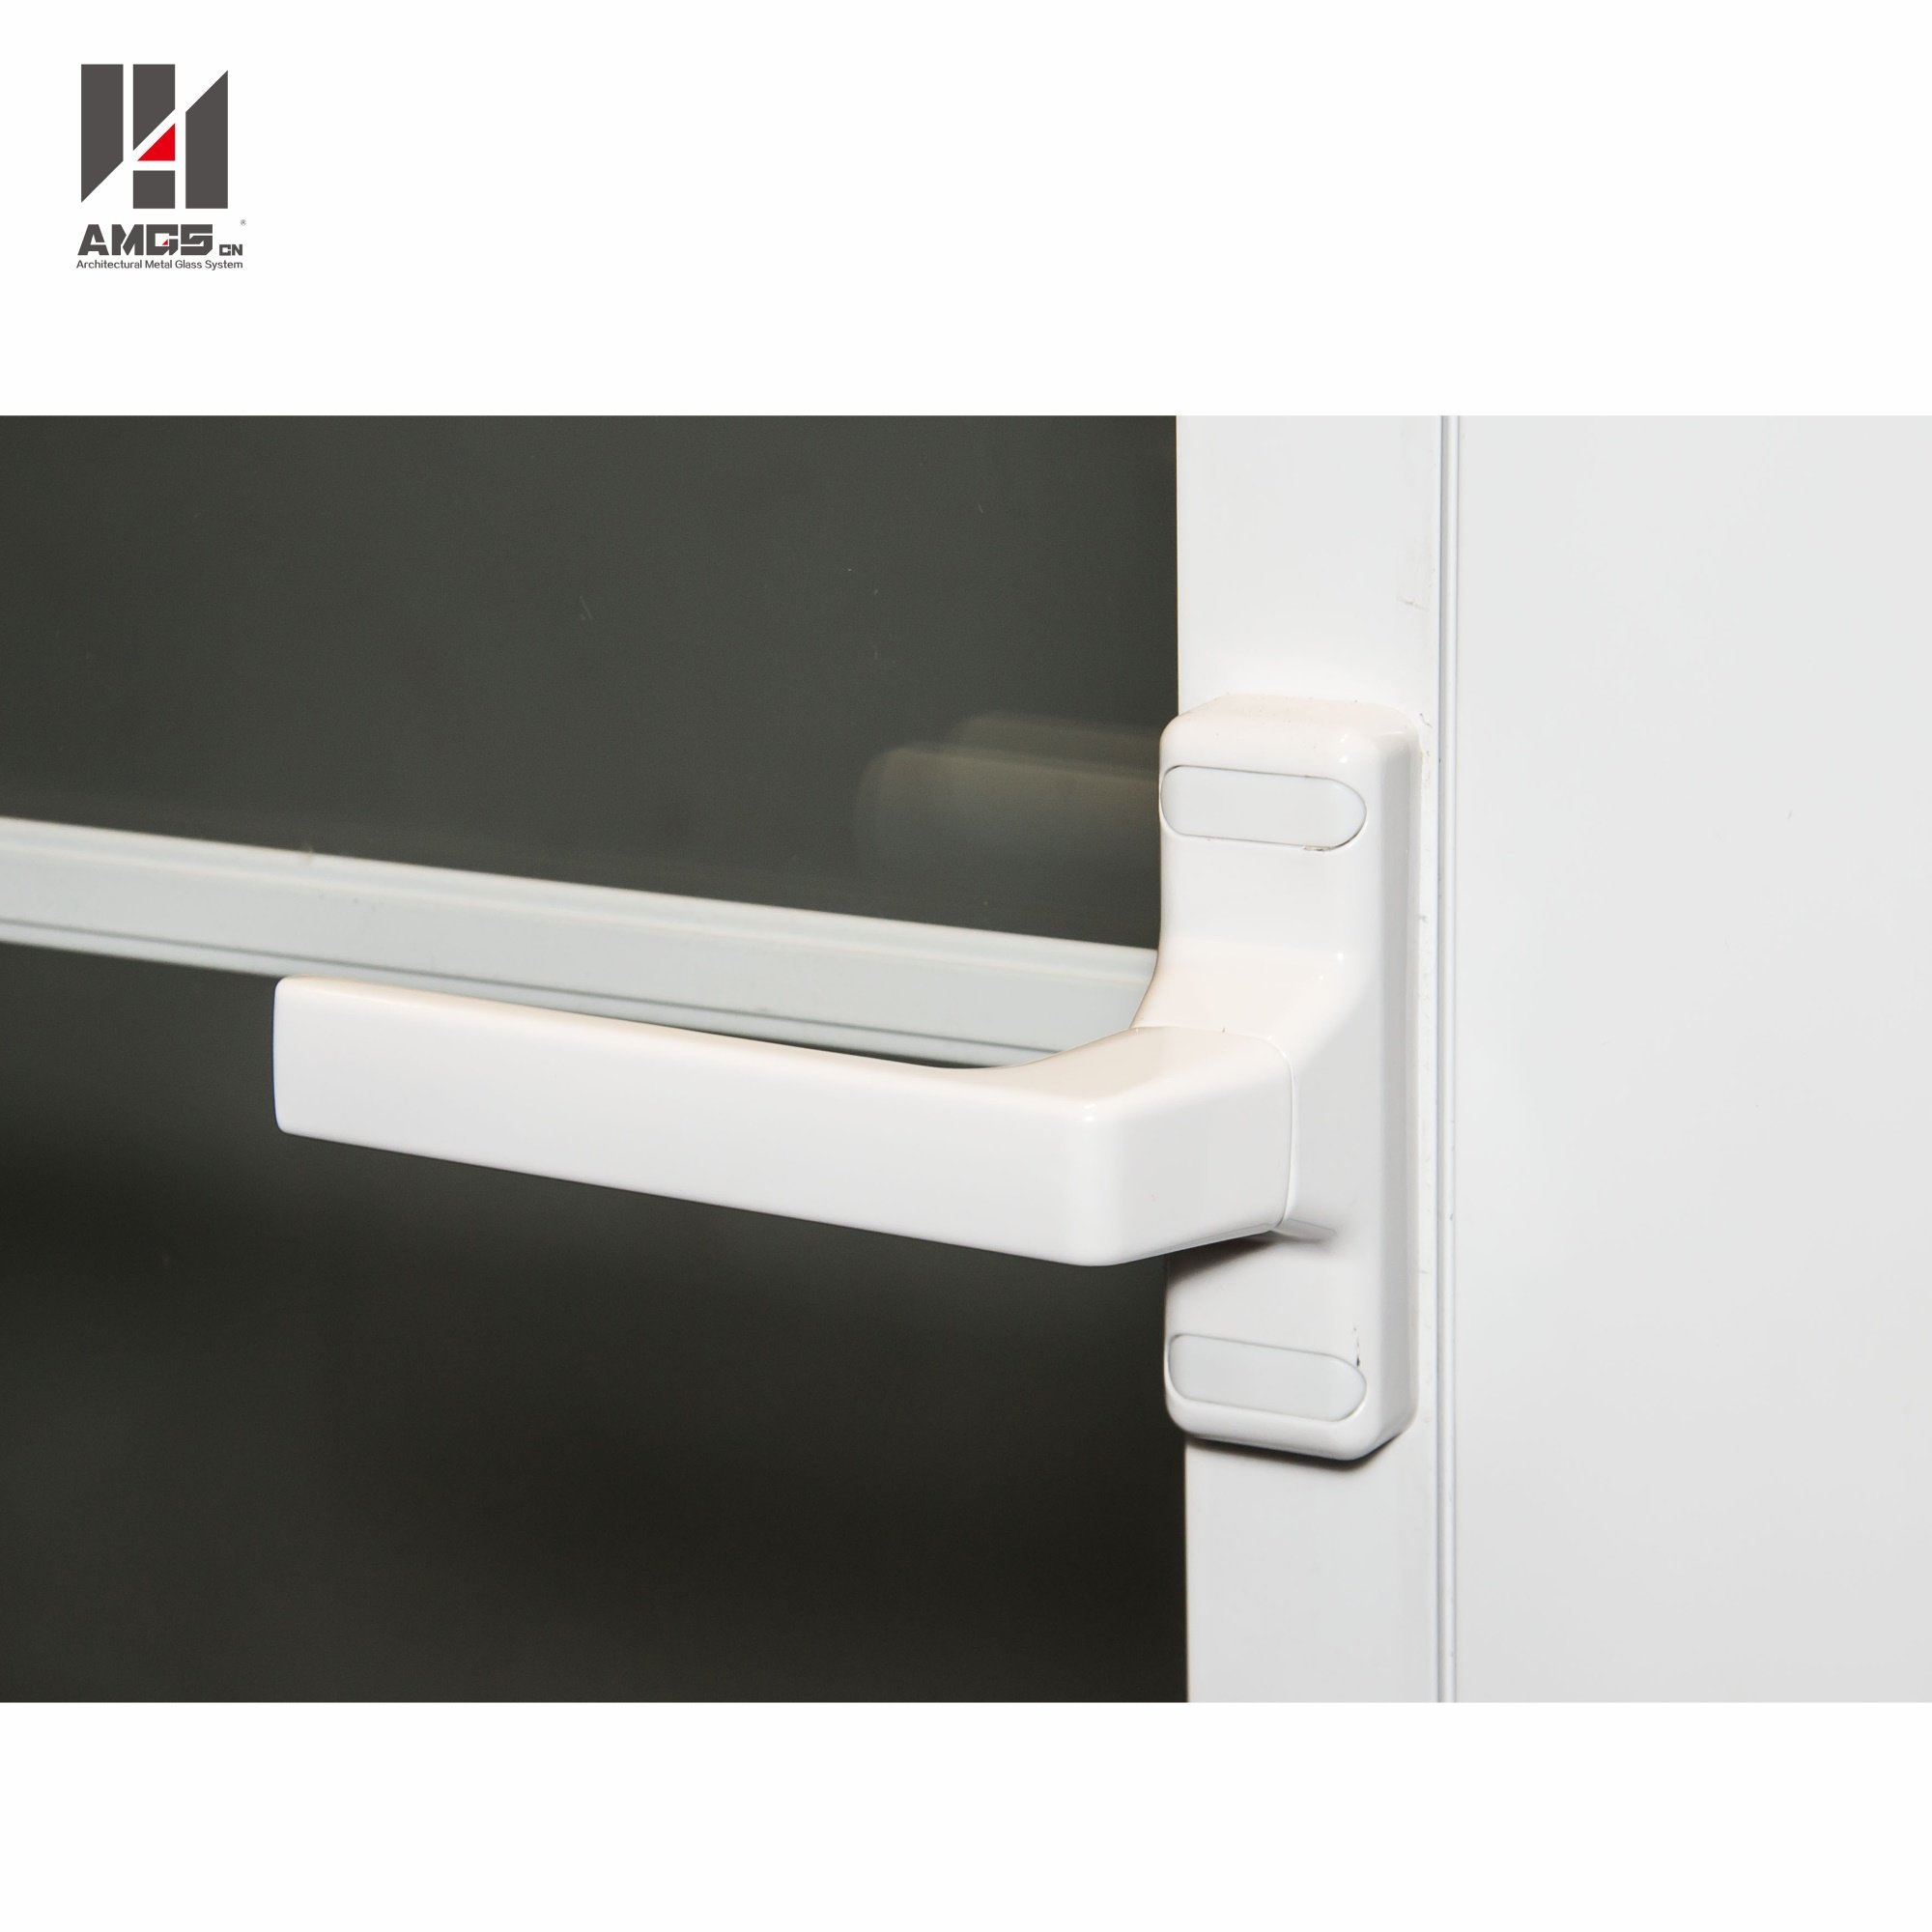 AMGS White Aluminum Casement Doors Windows With Grill Design Aluminum Casement Windows image15